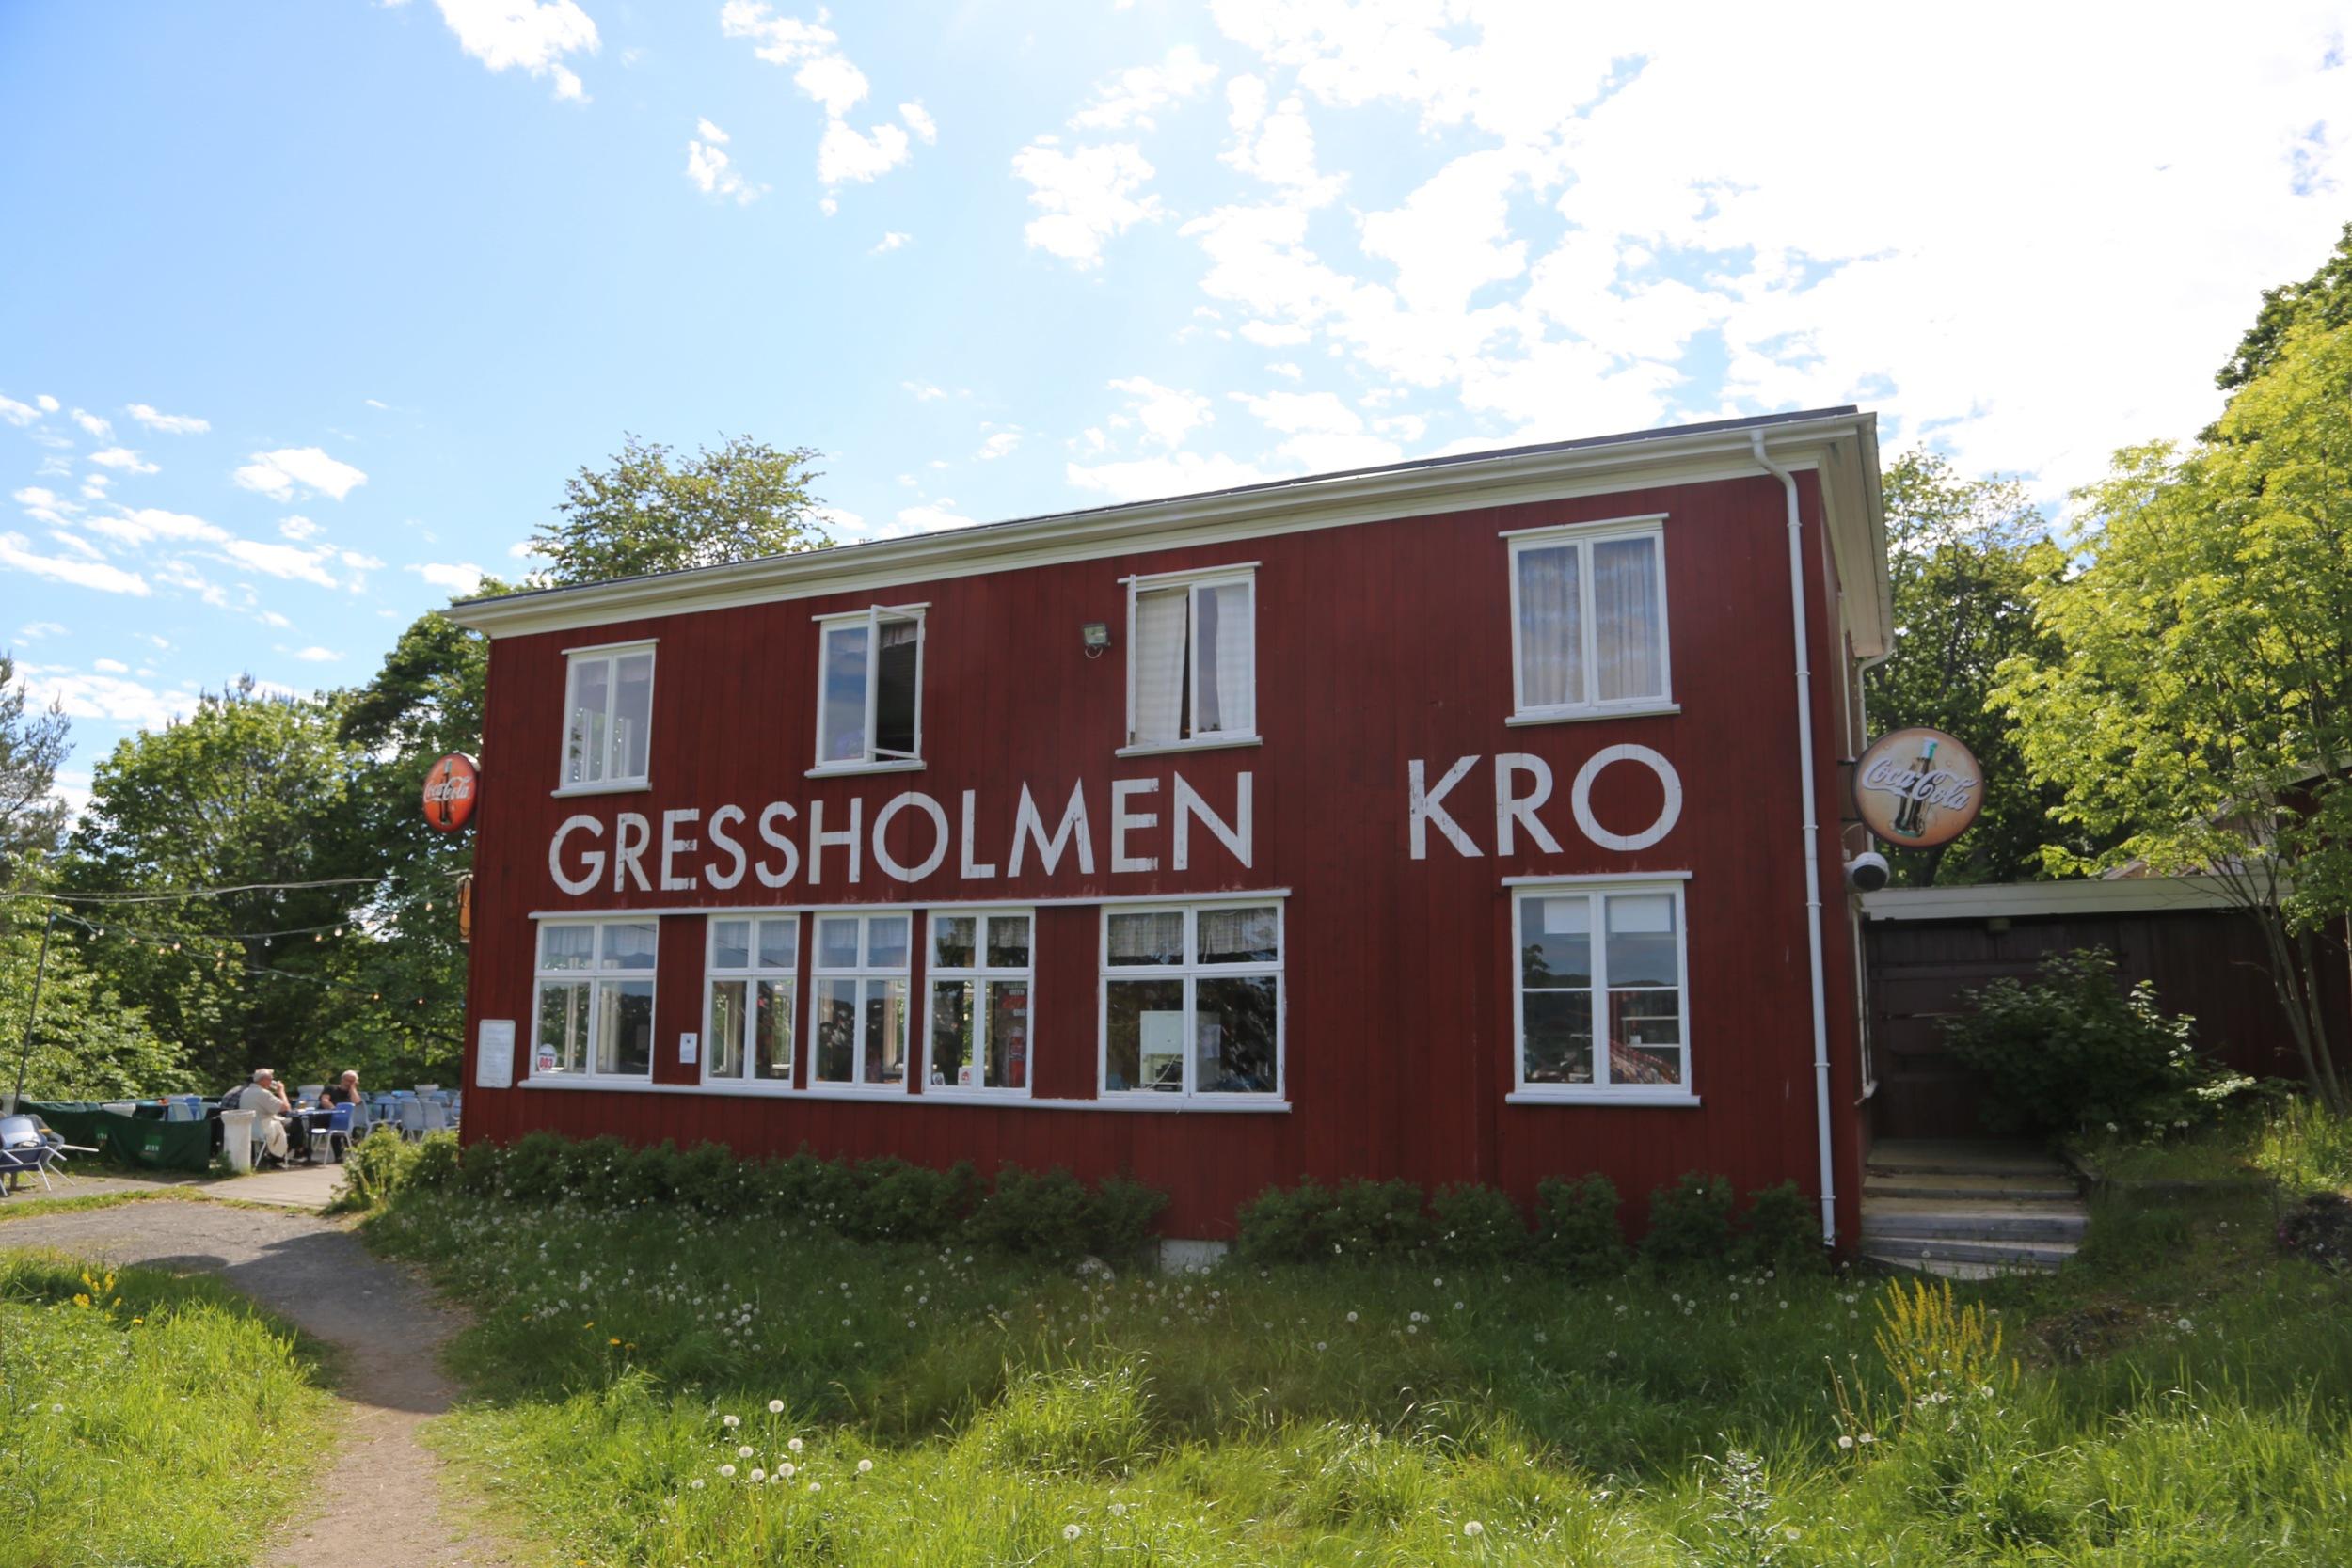 Gressholmen kro. Nostalgi og glede. Foto: odd Roar Lange